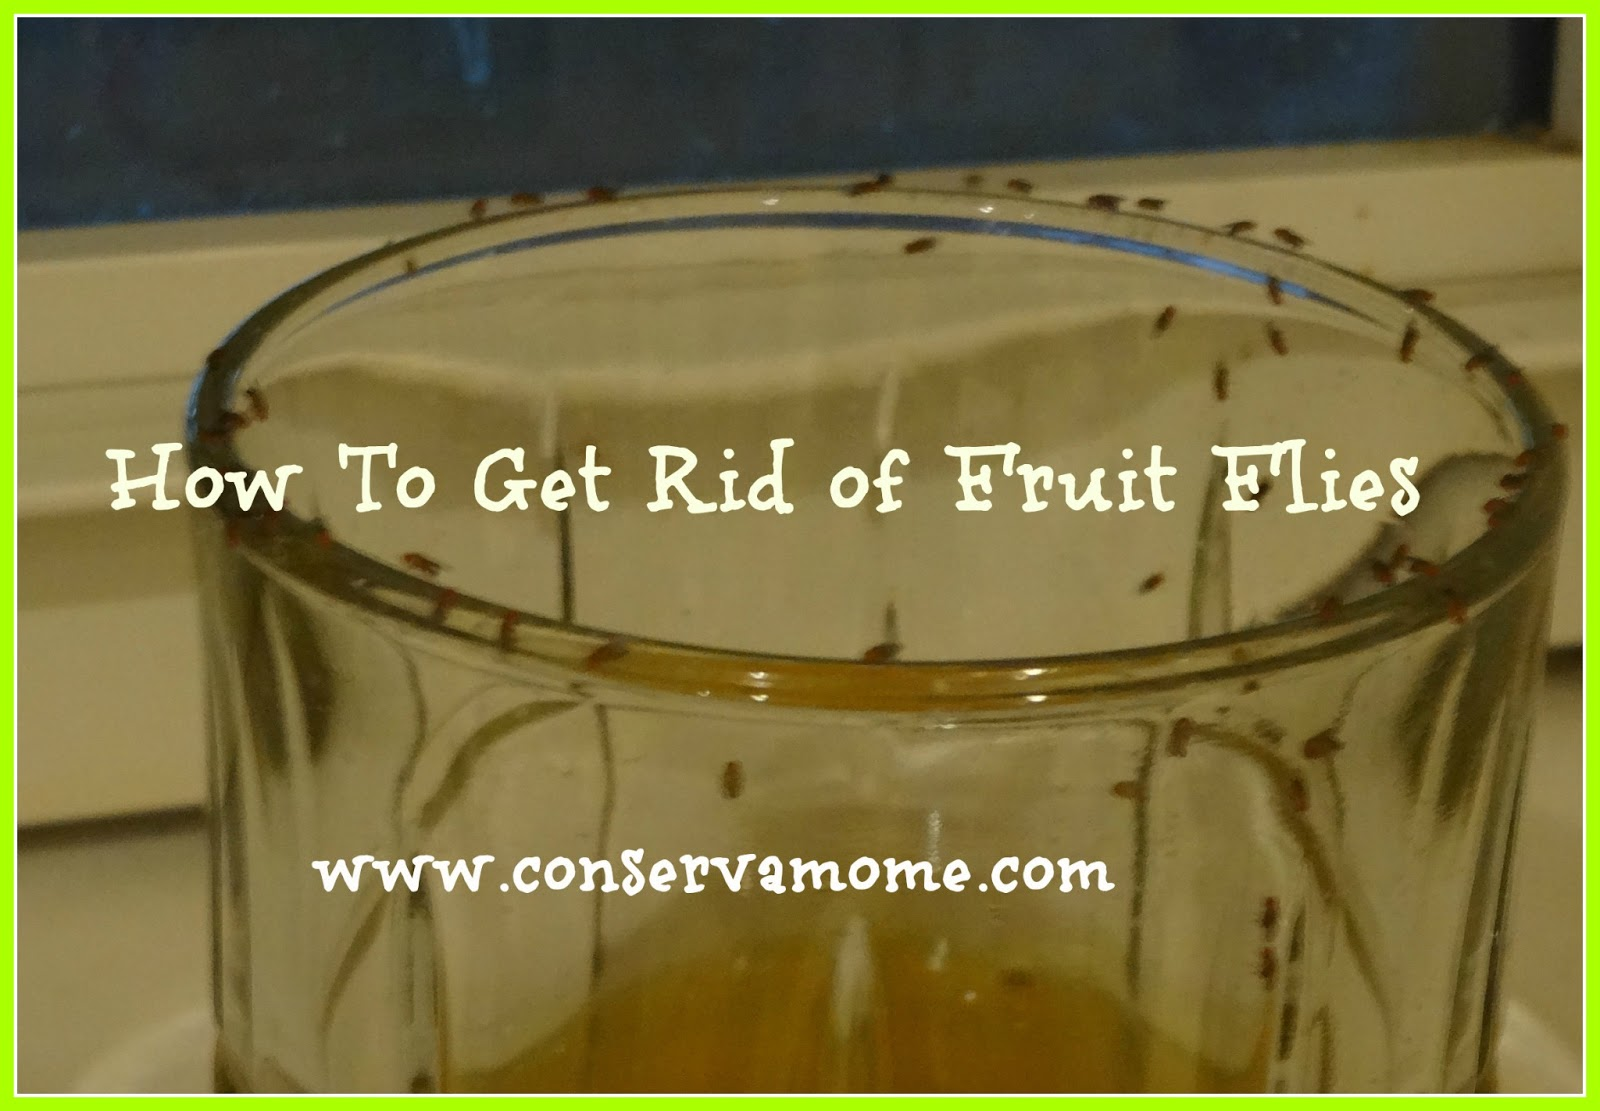 getting rid of fruit flies naturally conservamom. Black Bedroom Furniture Sets. Home Design Ideas